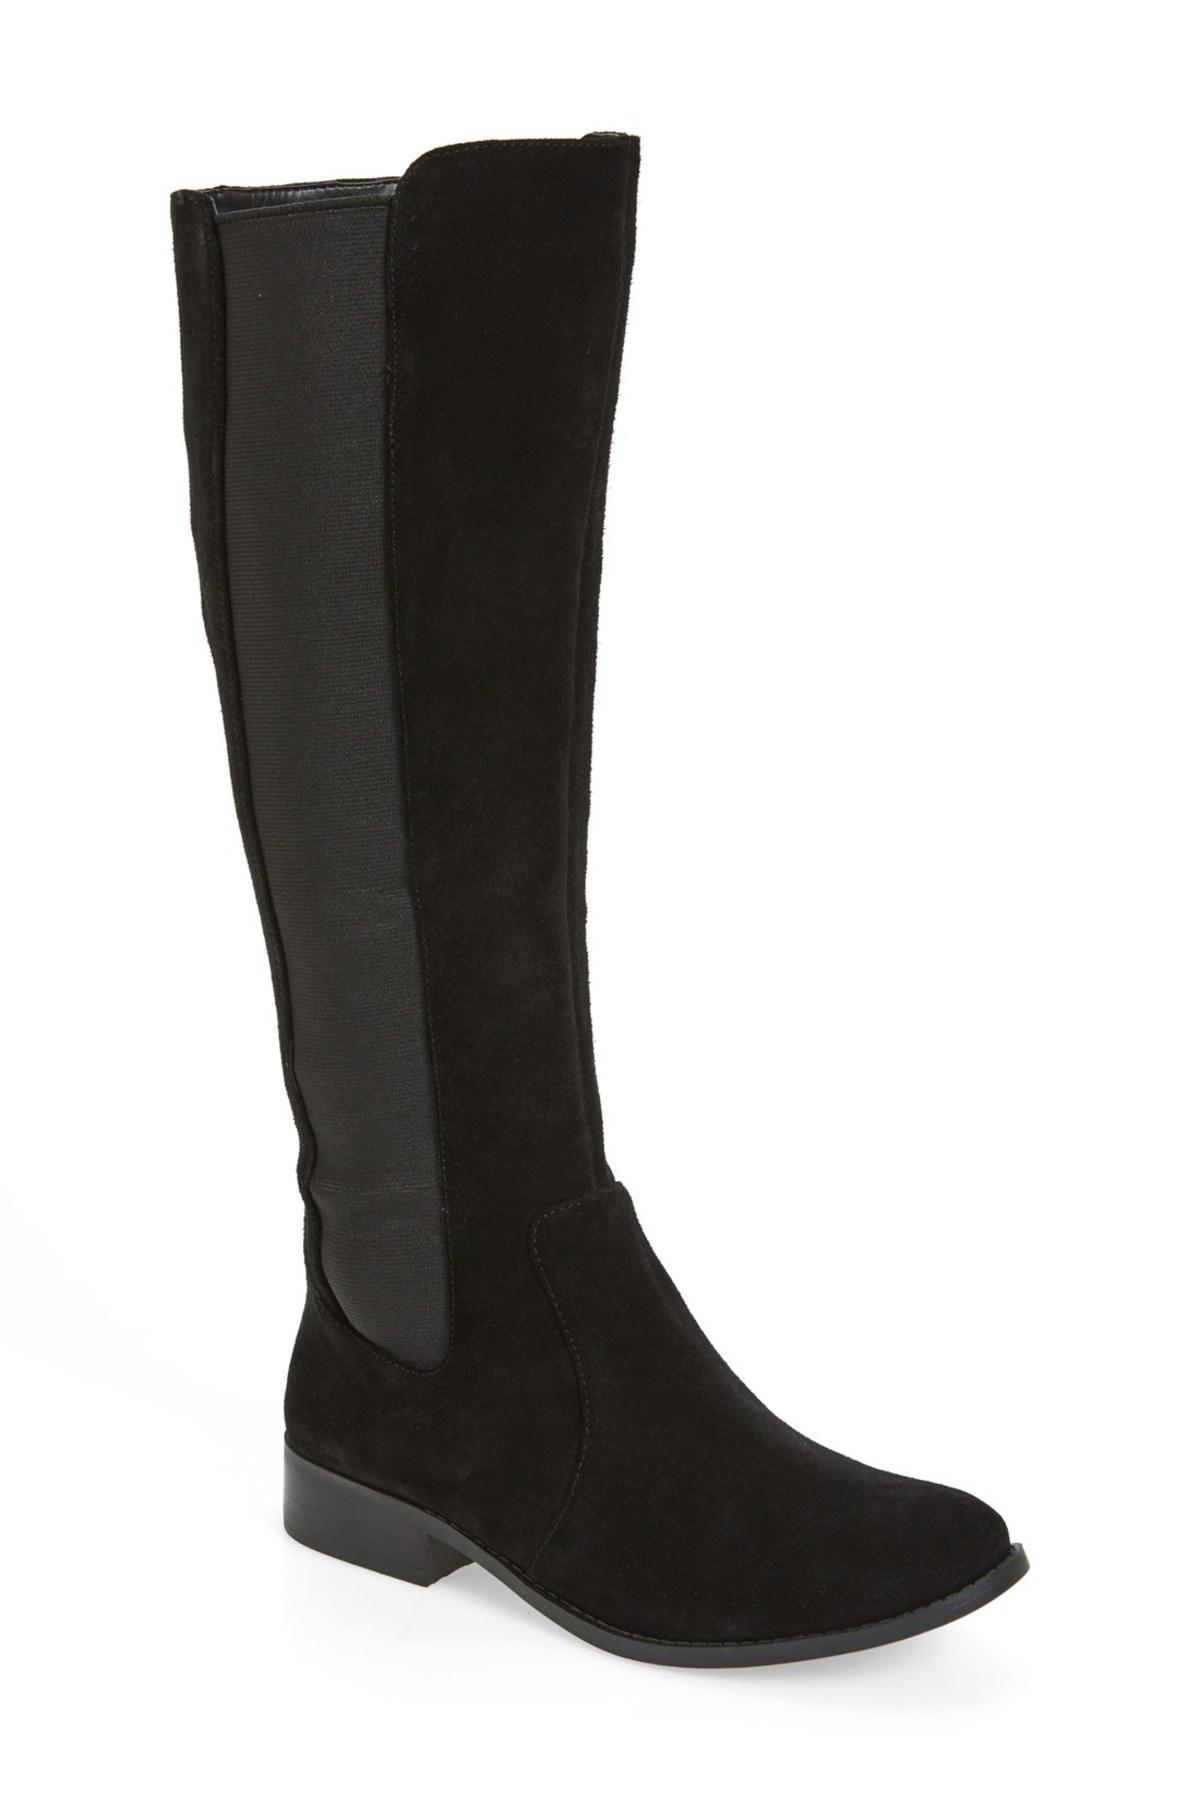 ricel boot regular